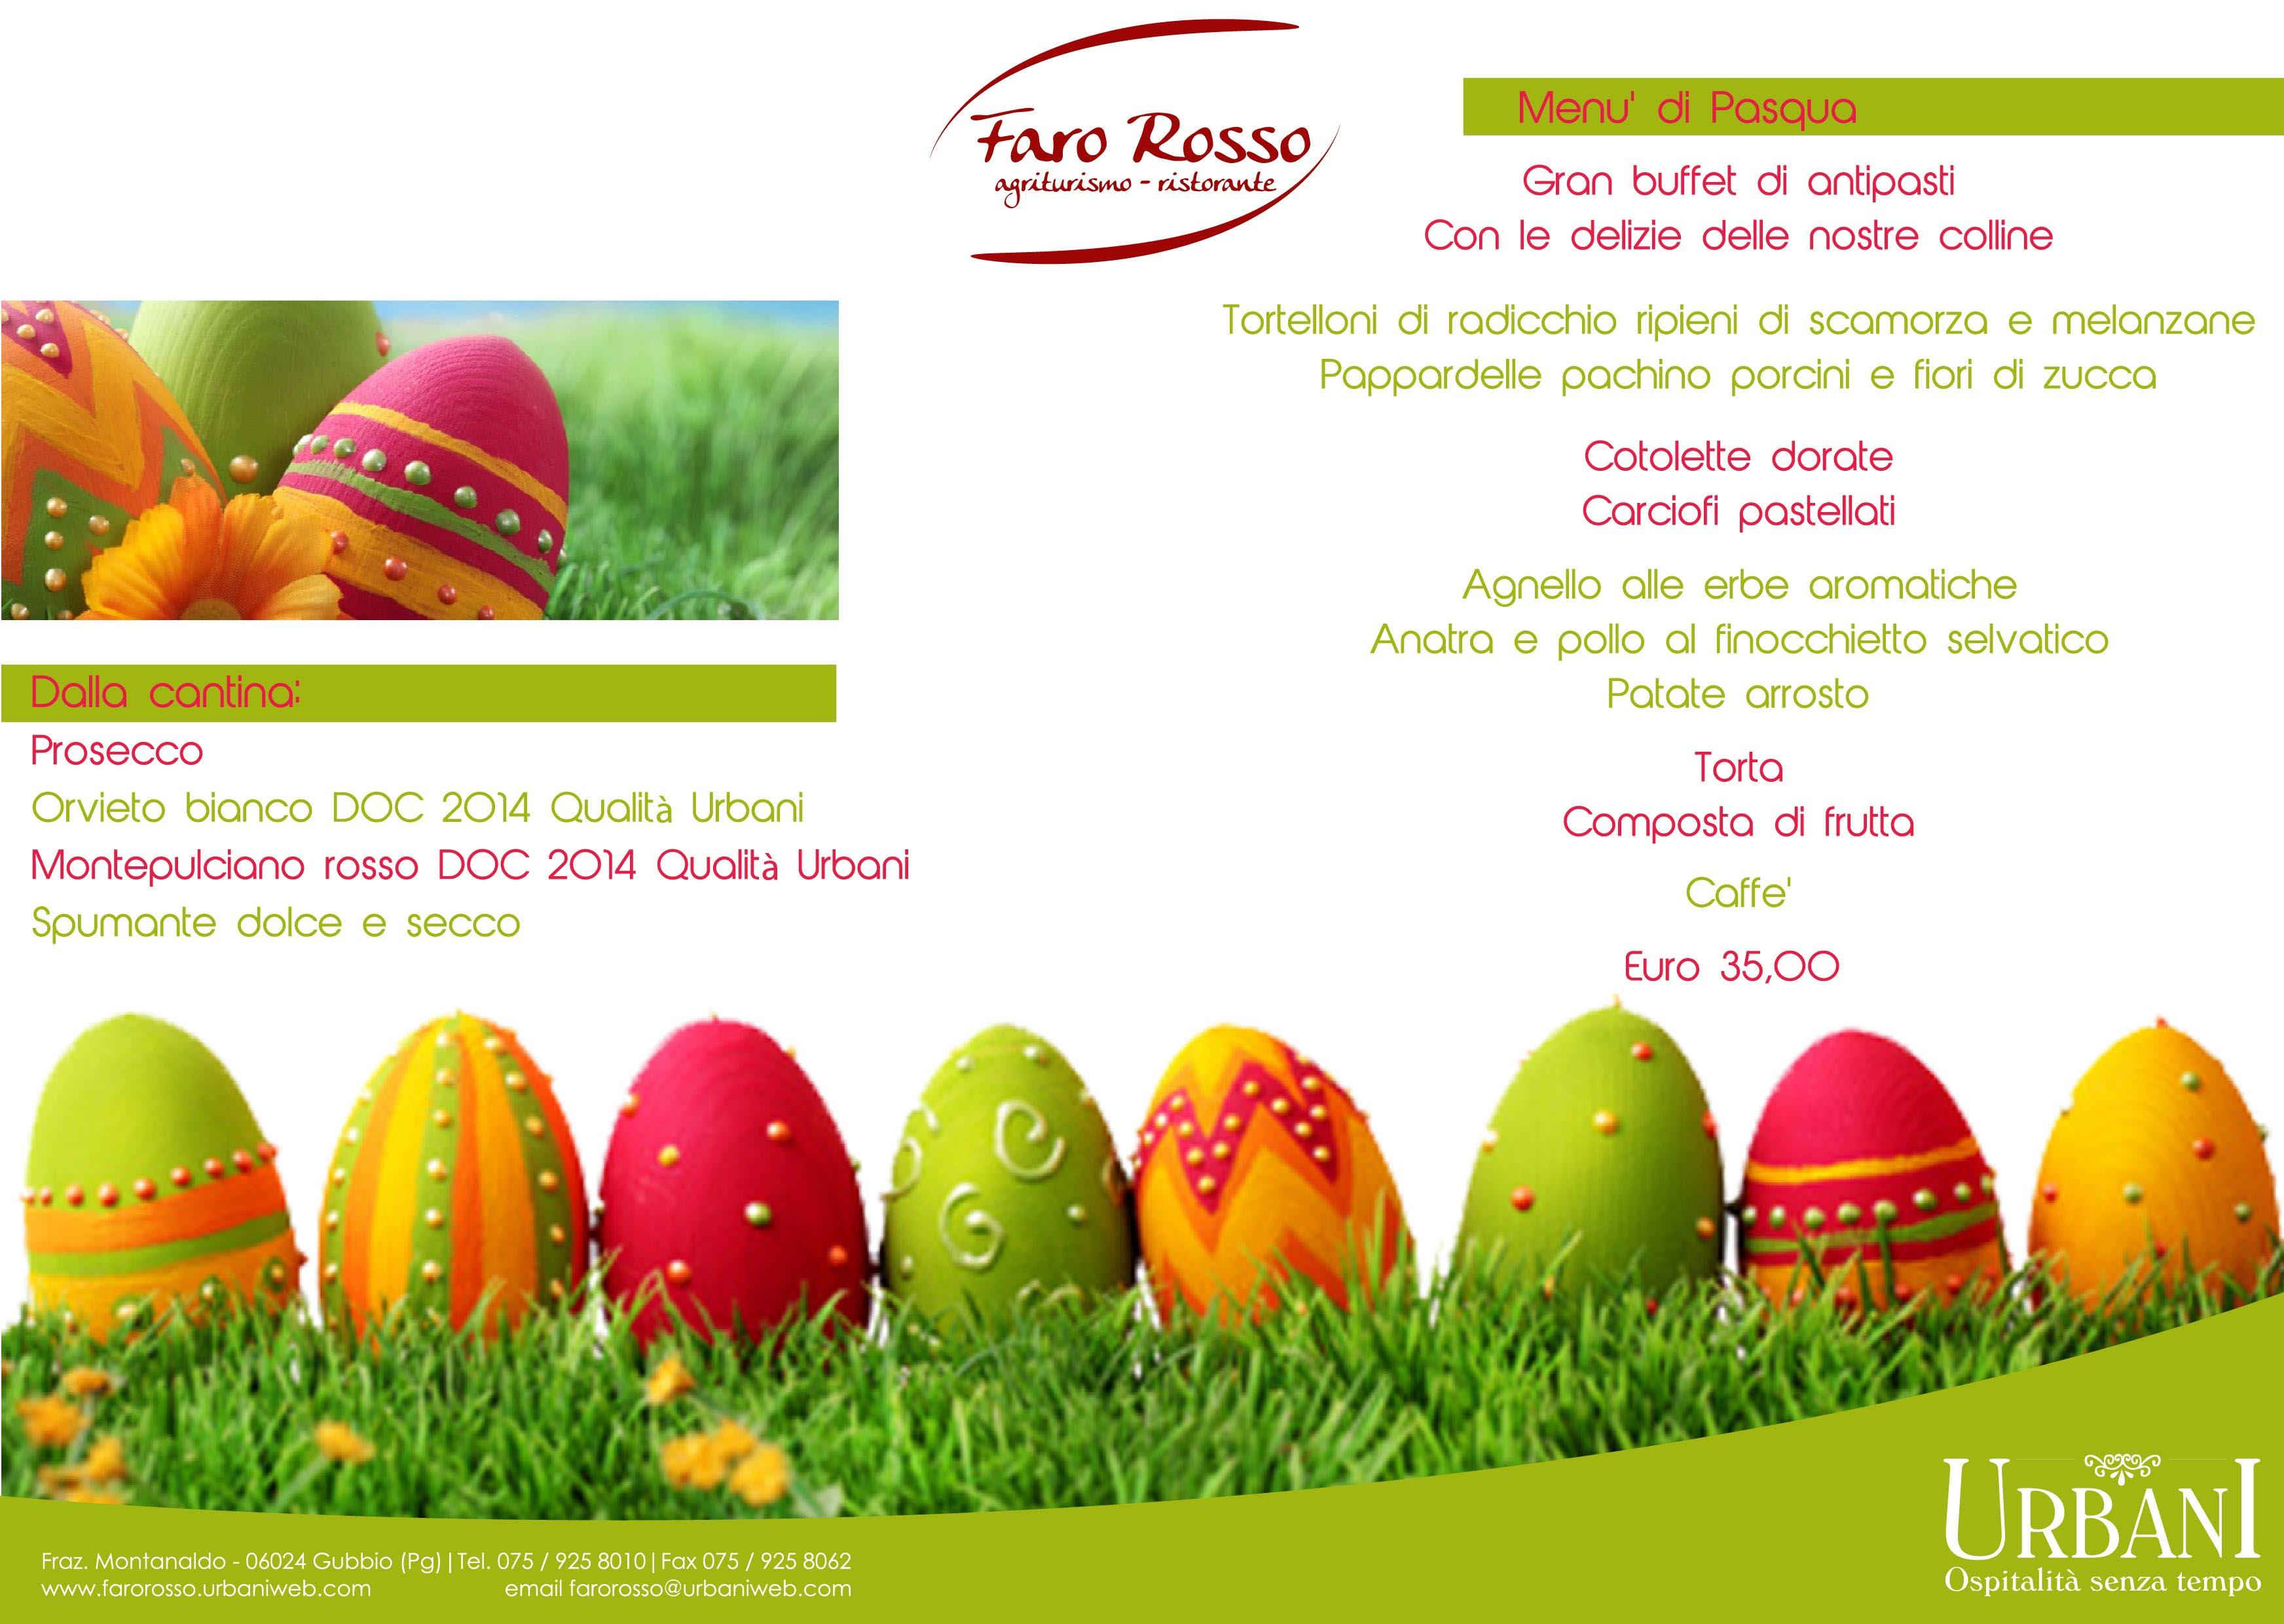 Pasqua a Gubbio